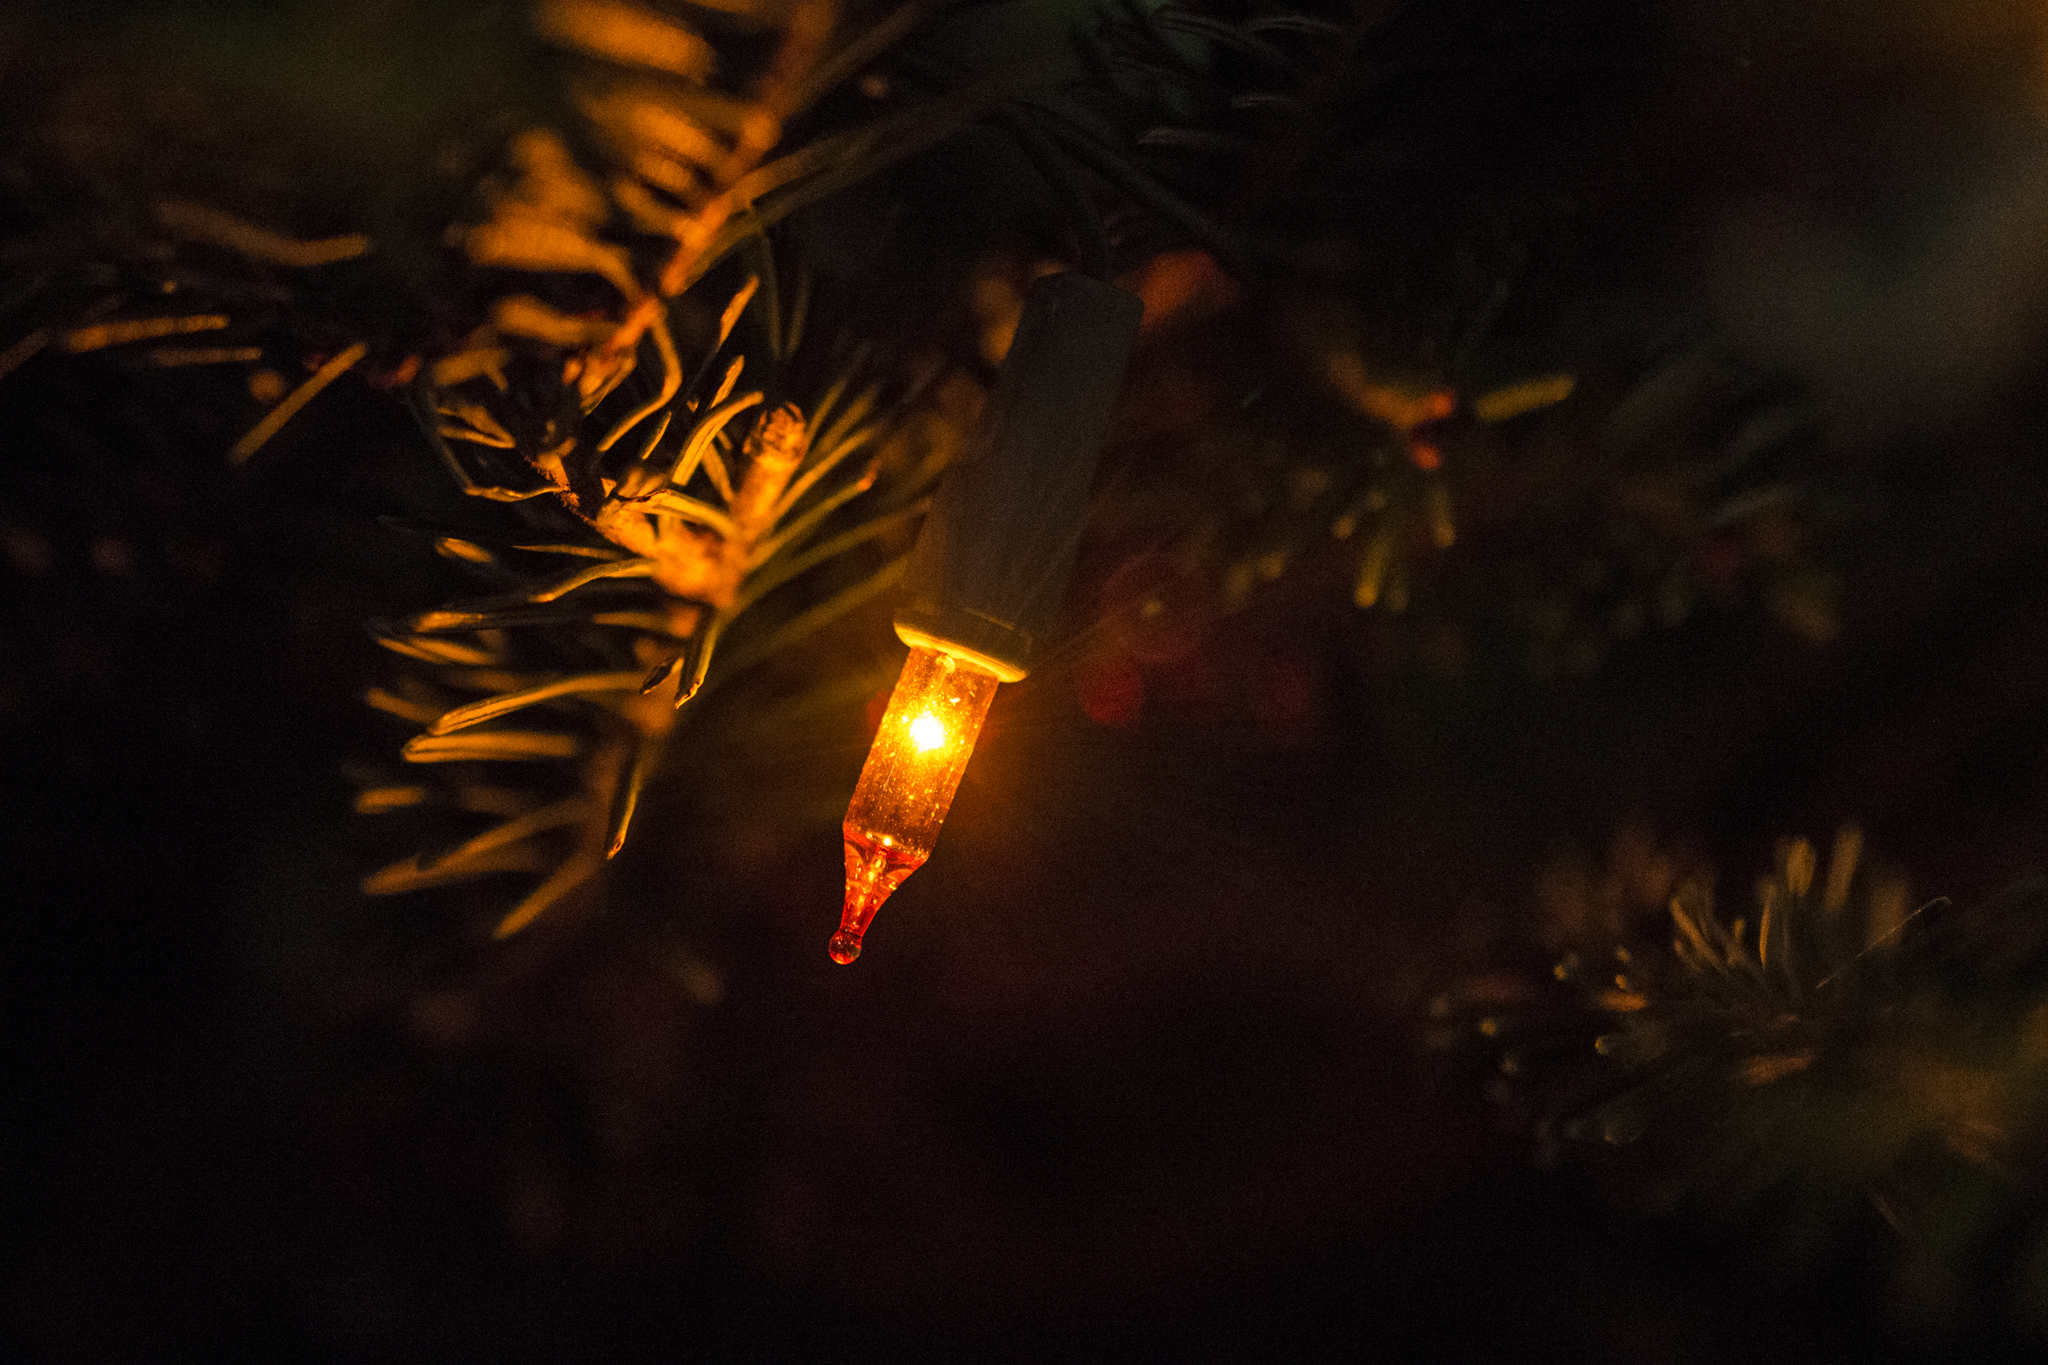 Orange Christmas light